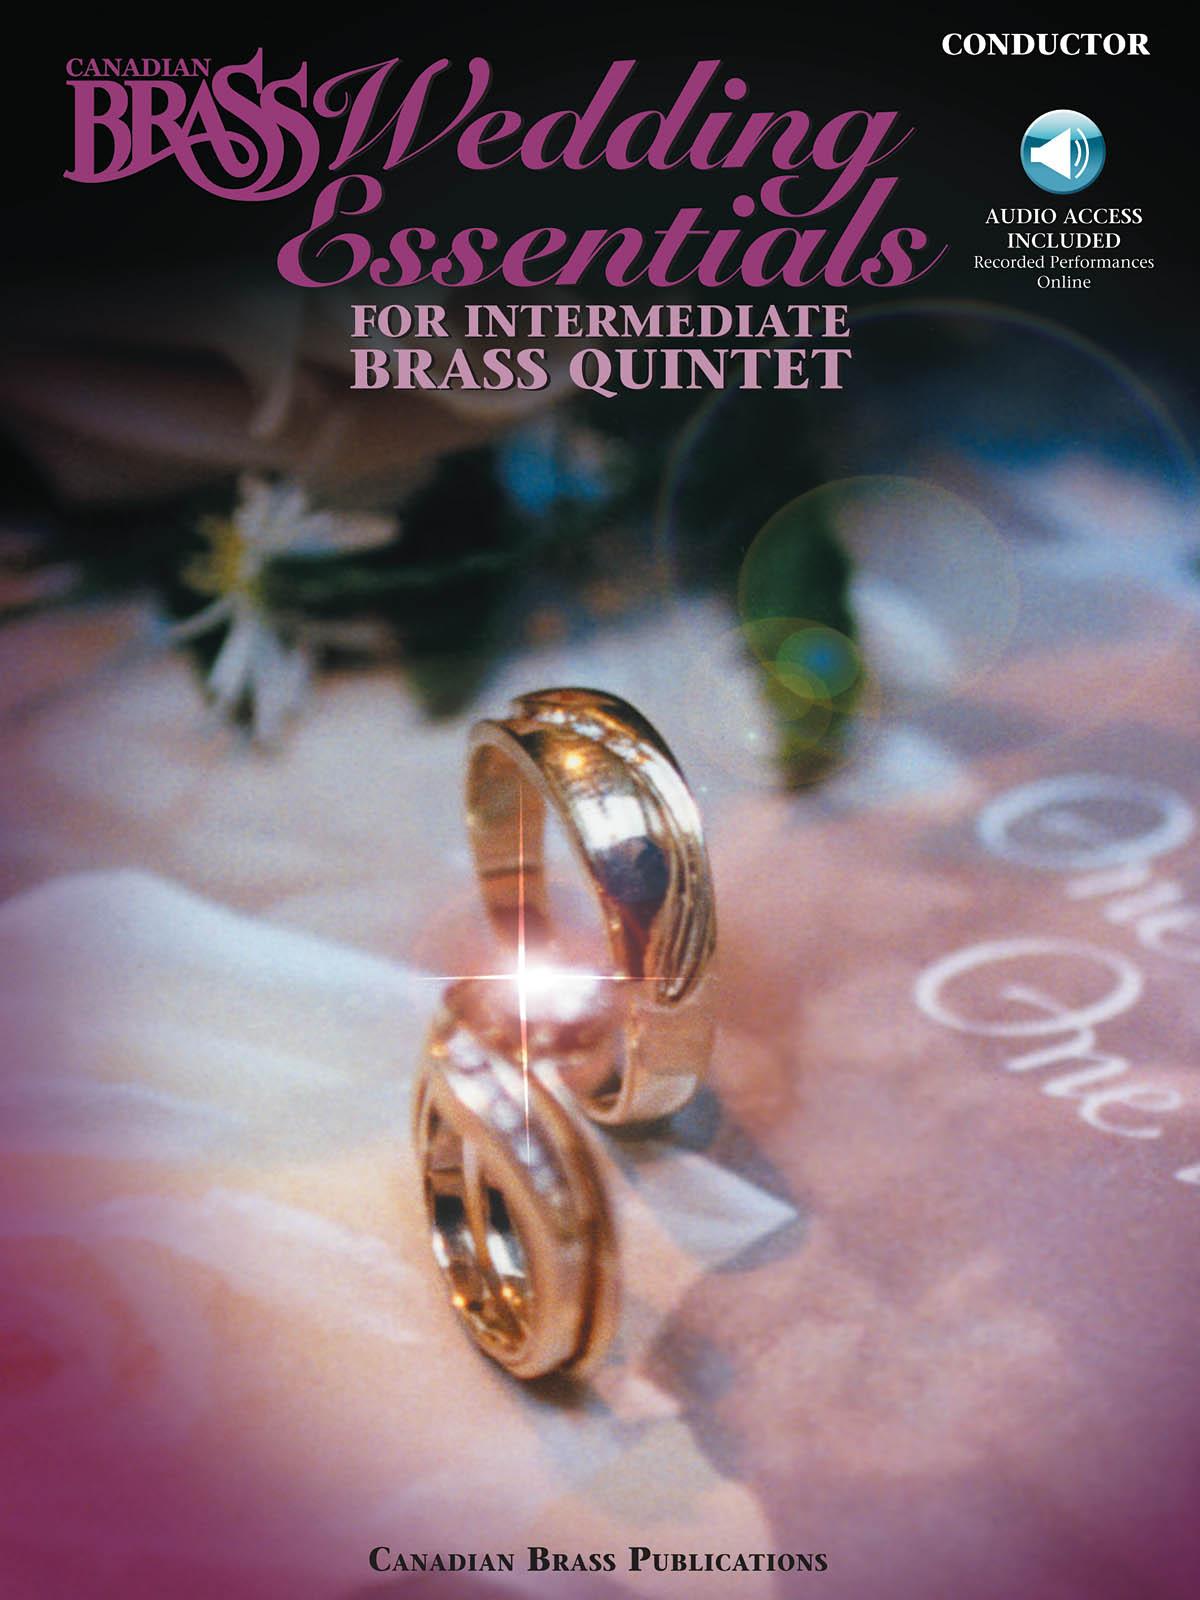 The Canadian Brass: The Canadian Brass Wedding Essentials: Brass Ensemble: Score